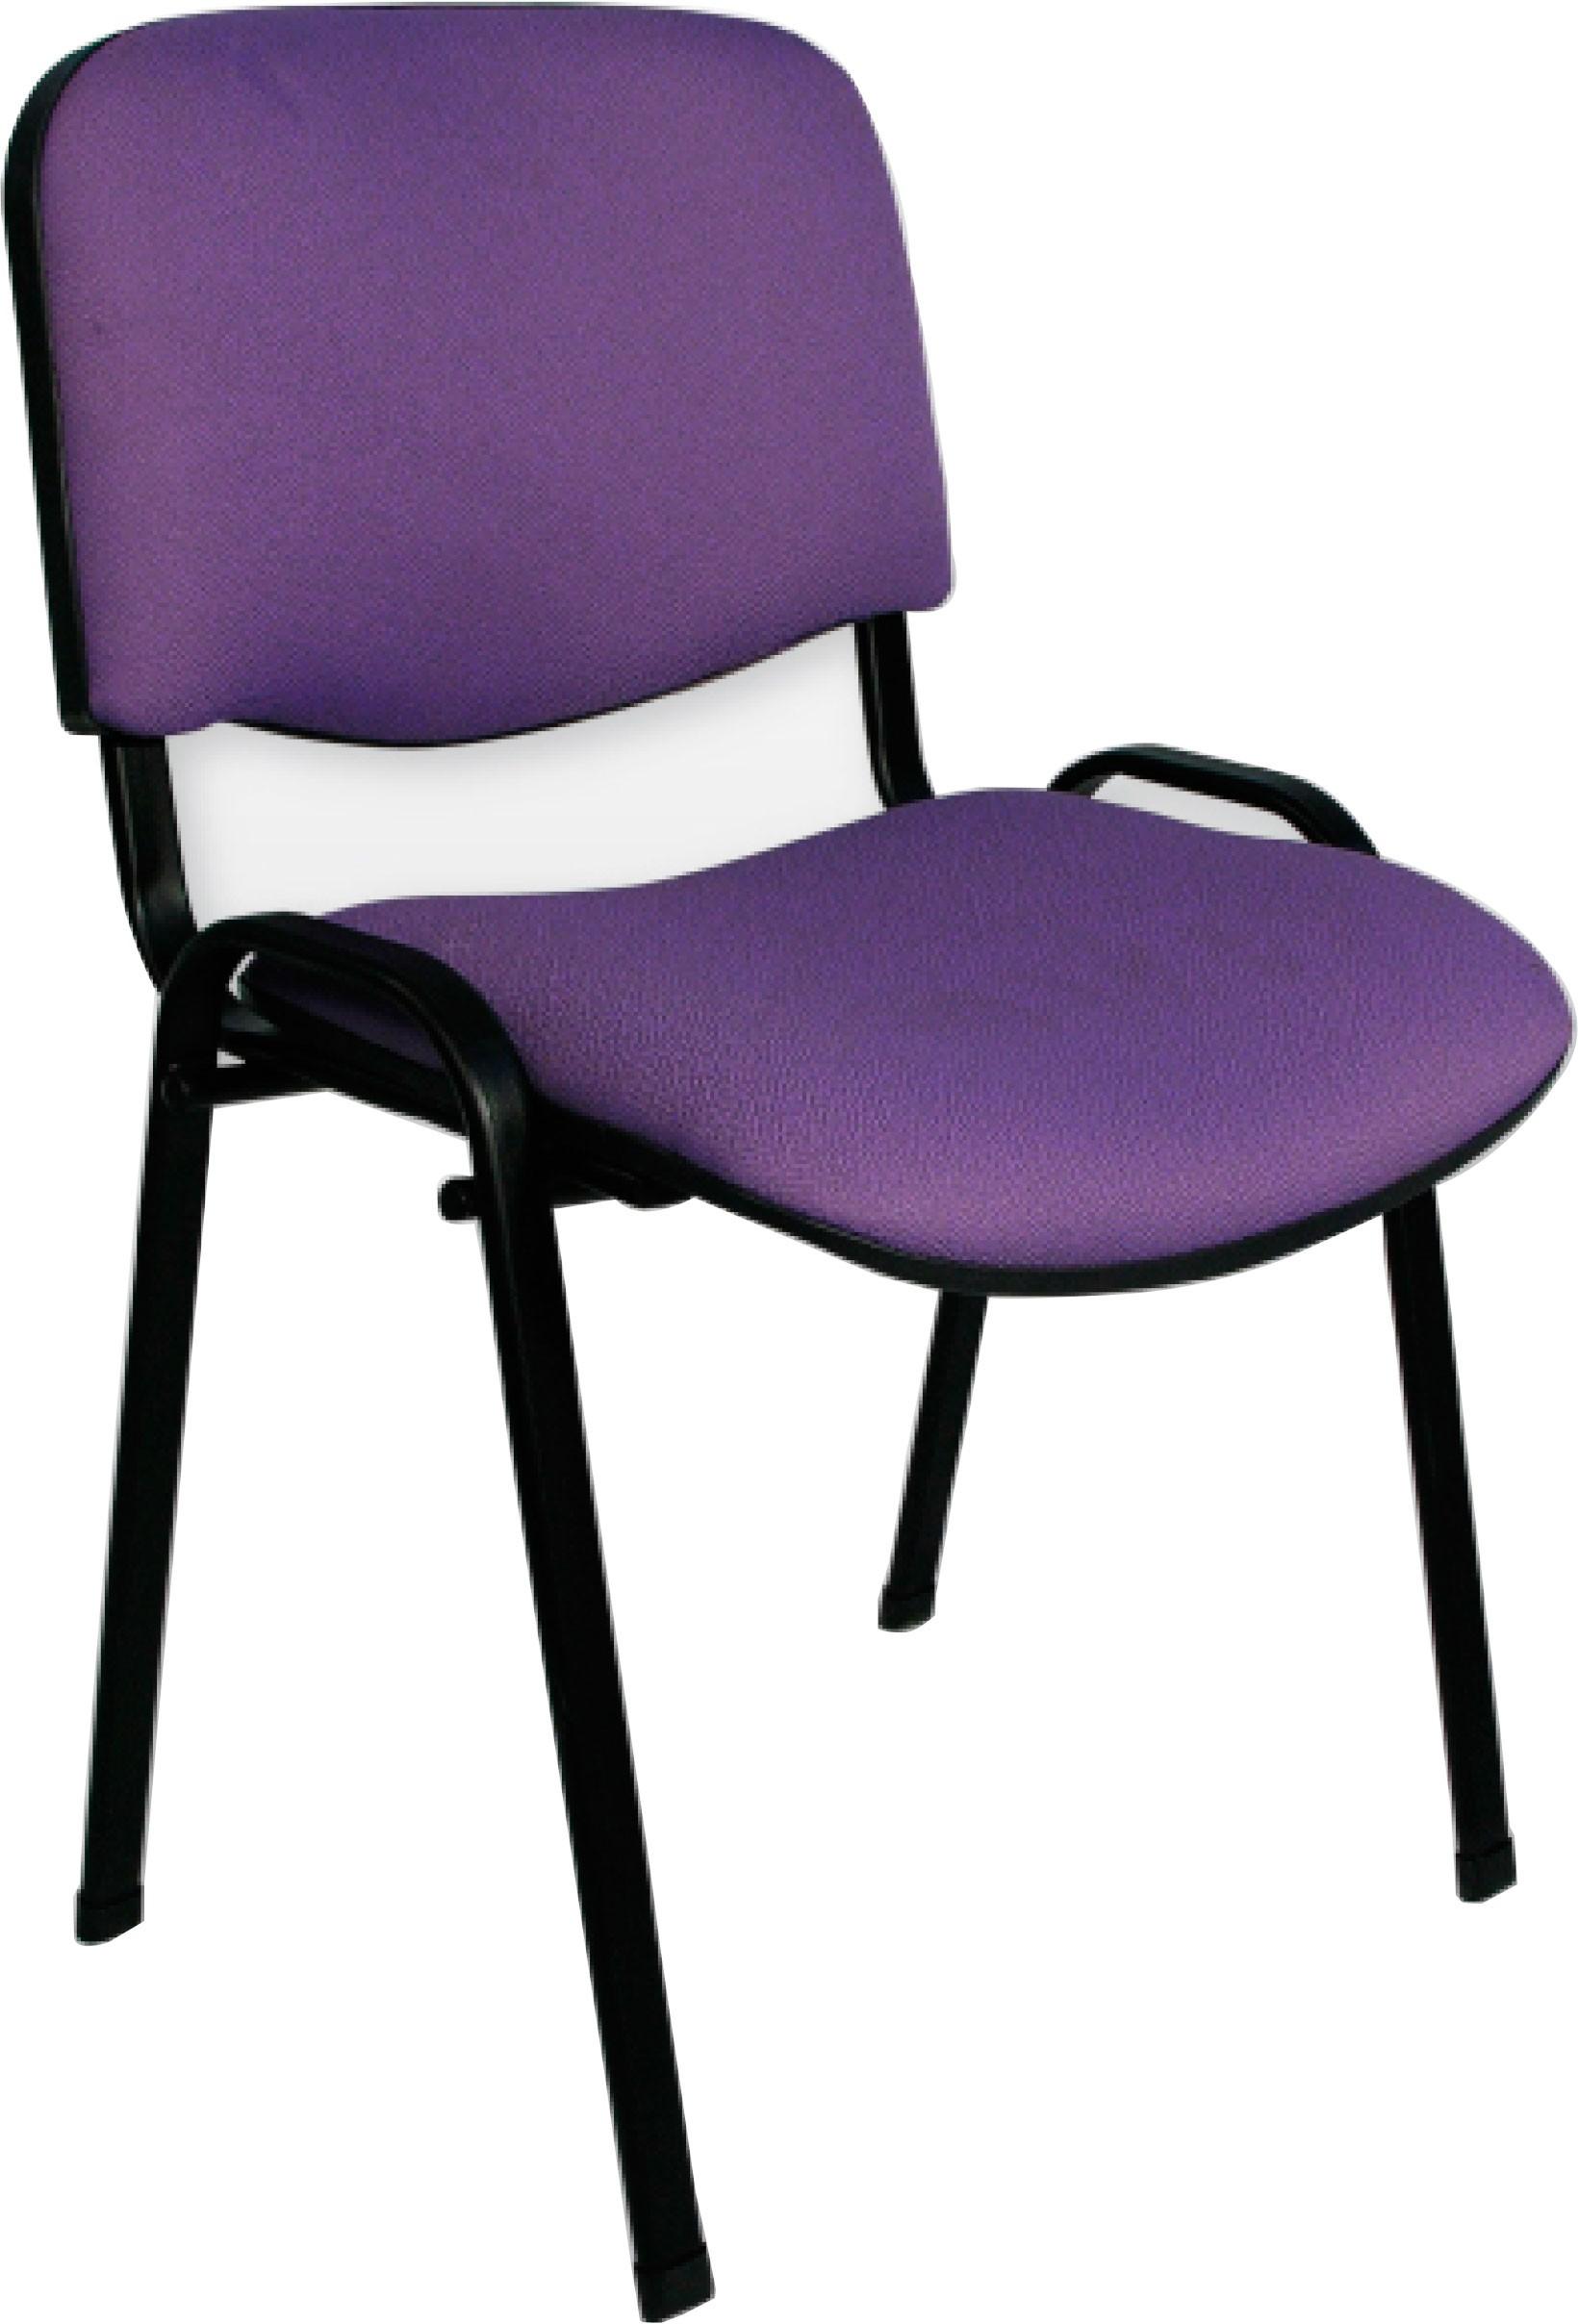 Muebles leal cordoba obtenga ideas dise o de muebles for Sillas oficina cordoba